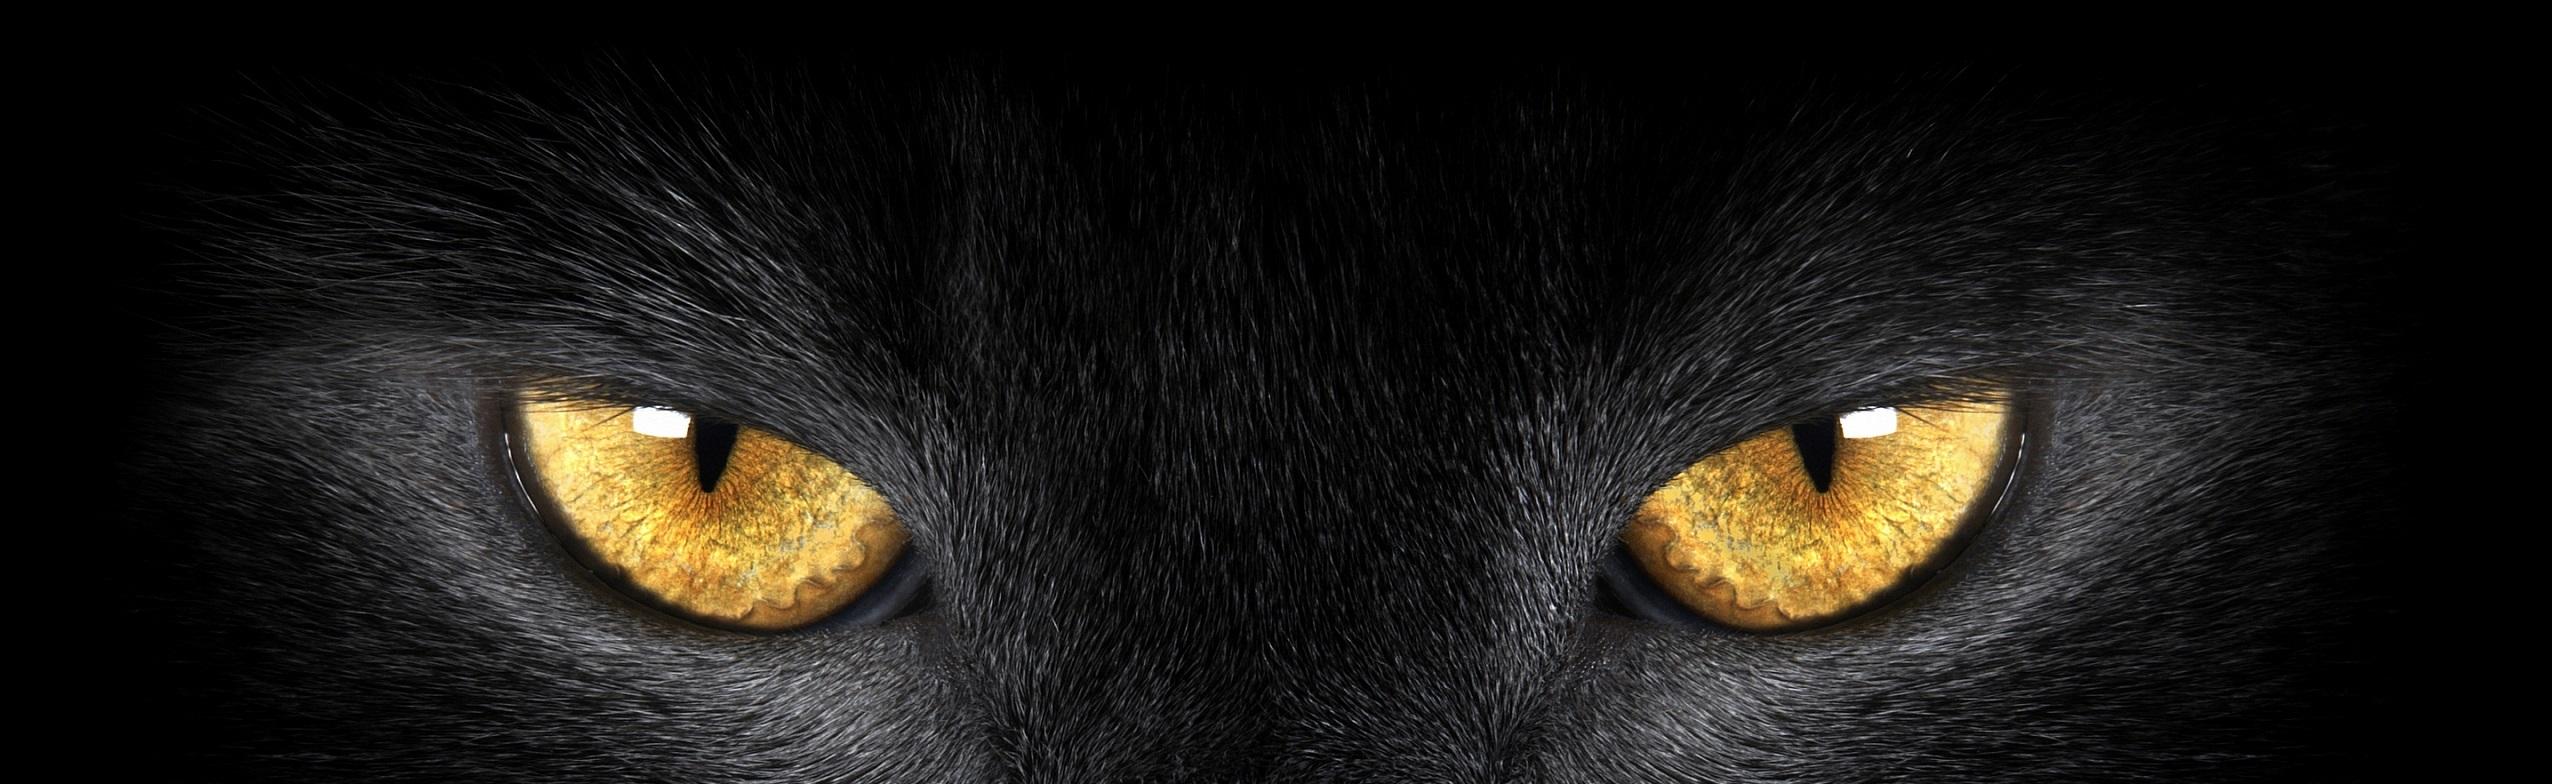 Black Cat Green Eyes Tumblr